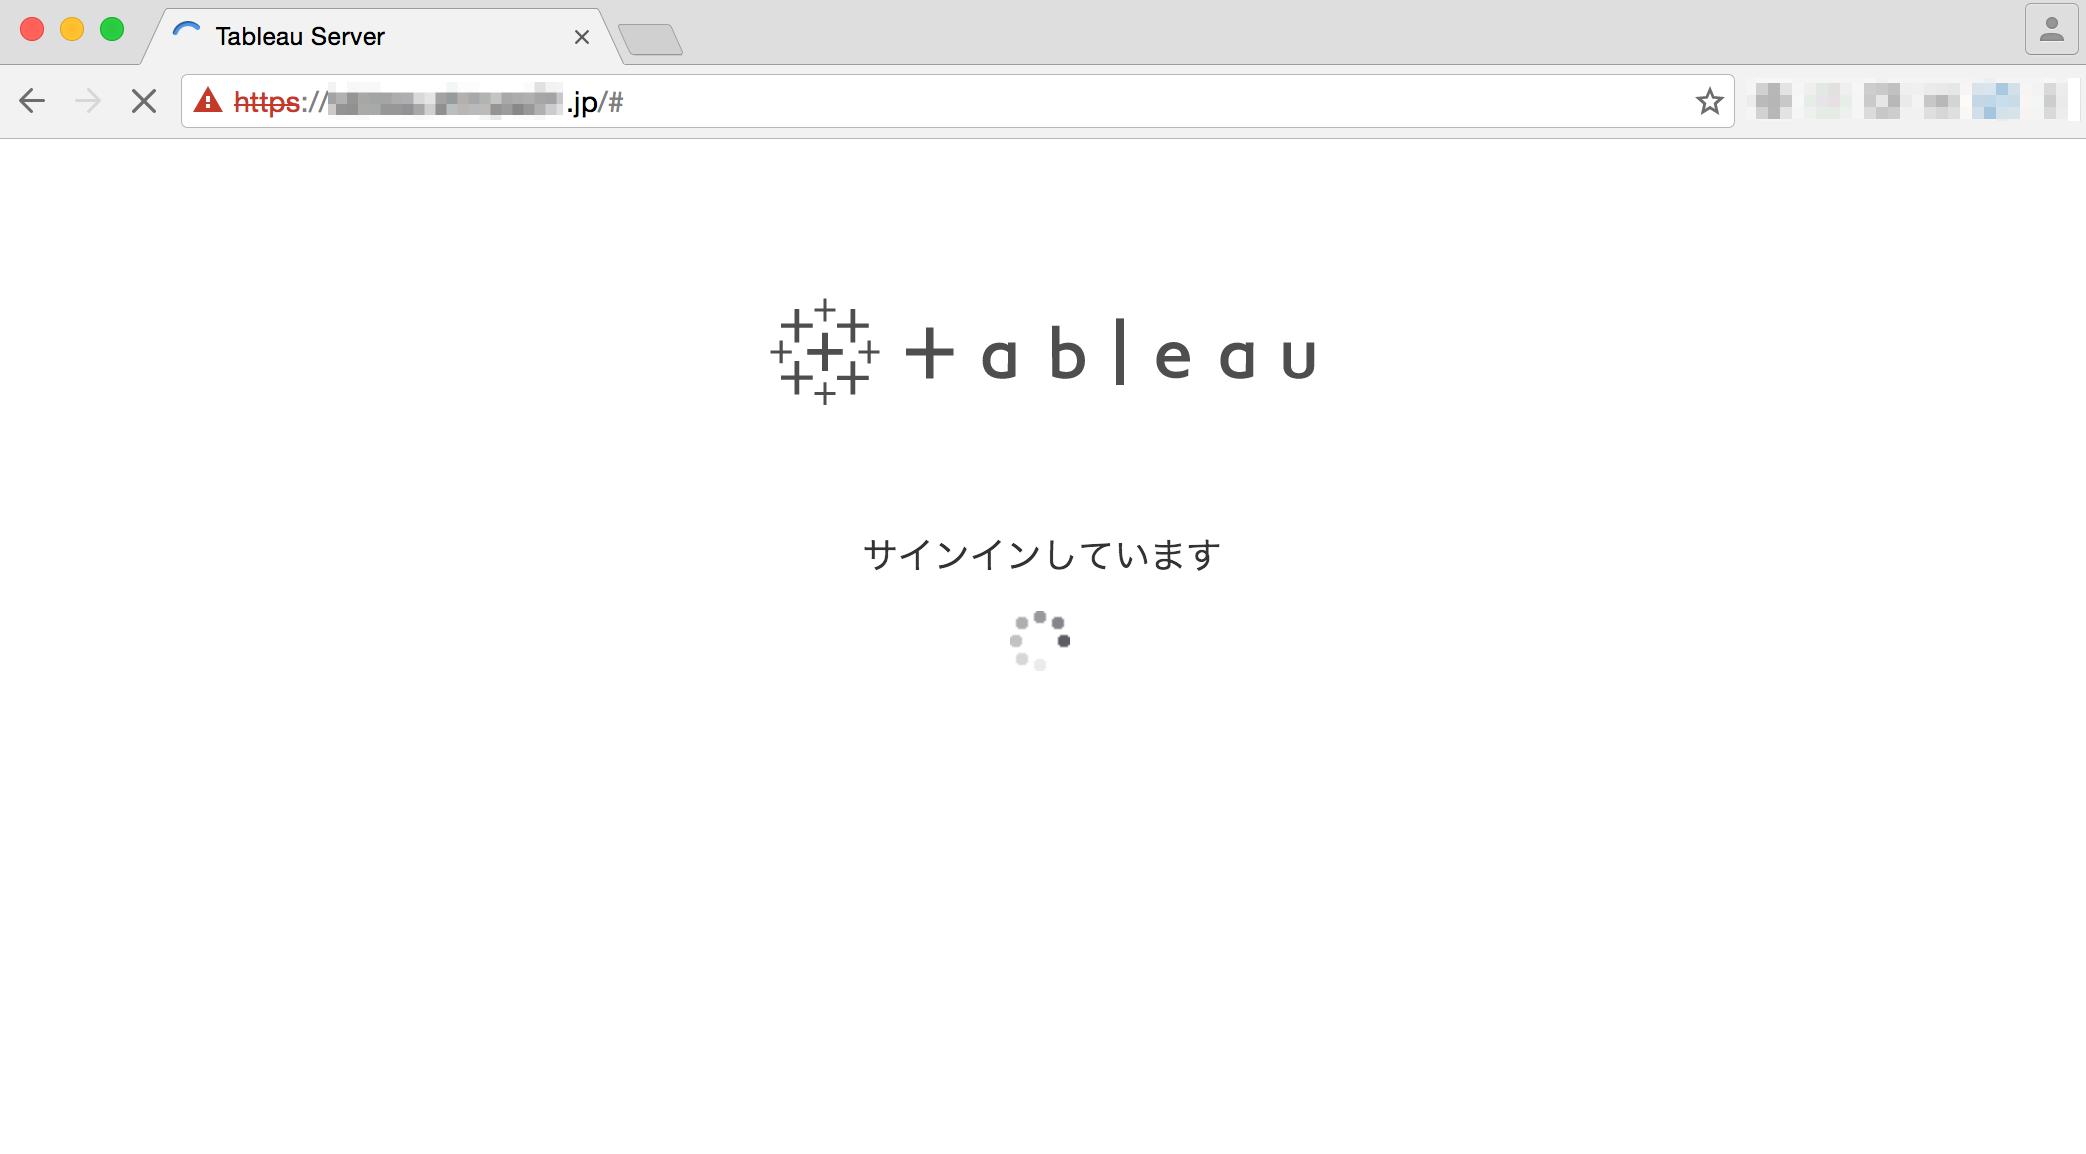 tableau-googleapps-openid-integration_16